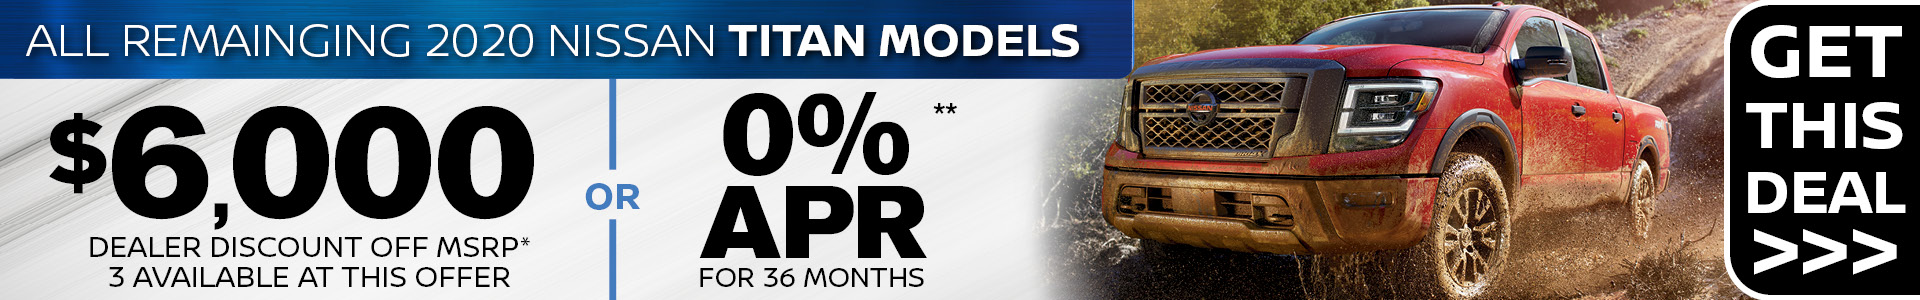 Mossy Nissan - 2020 Titan SRP